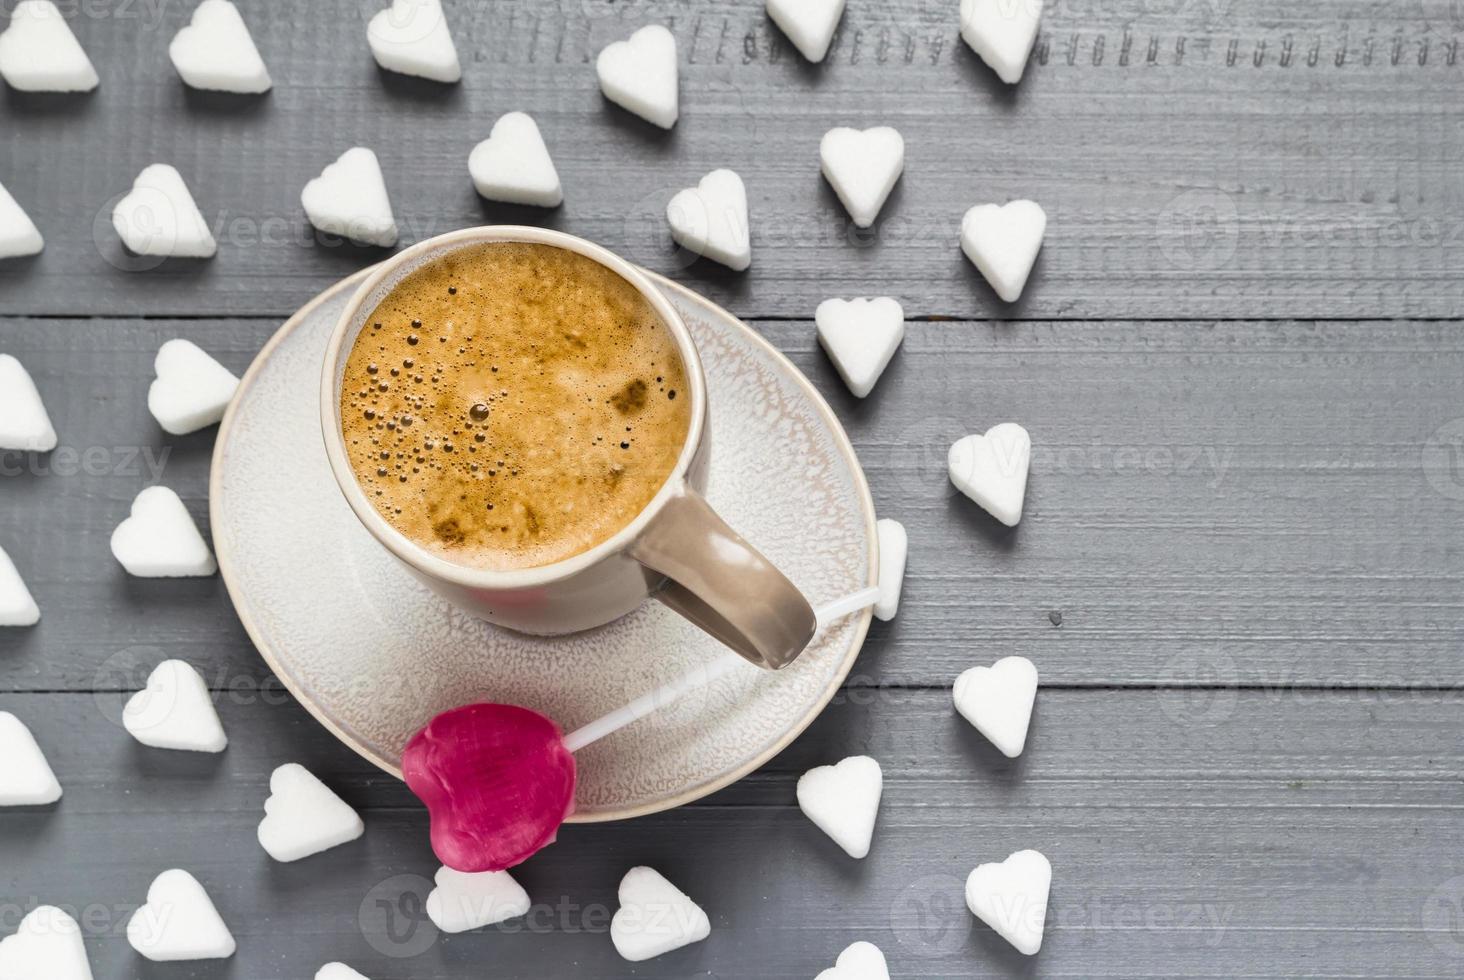 kopje koffie snoep hartvormige lolly suikerklontjes foto